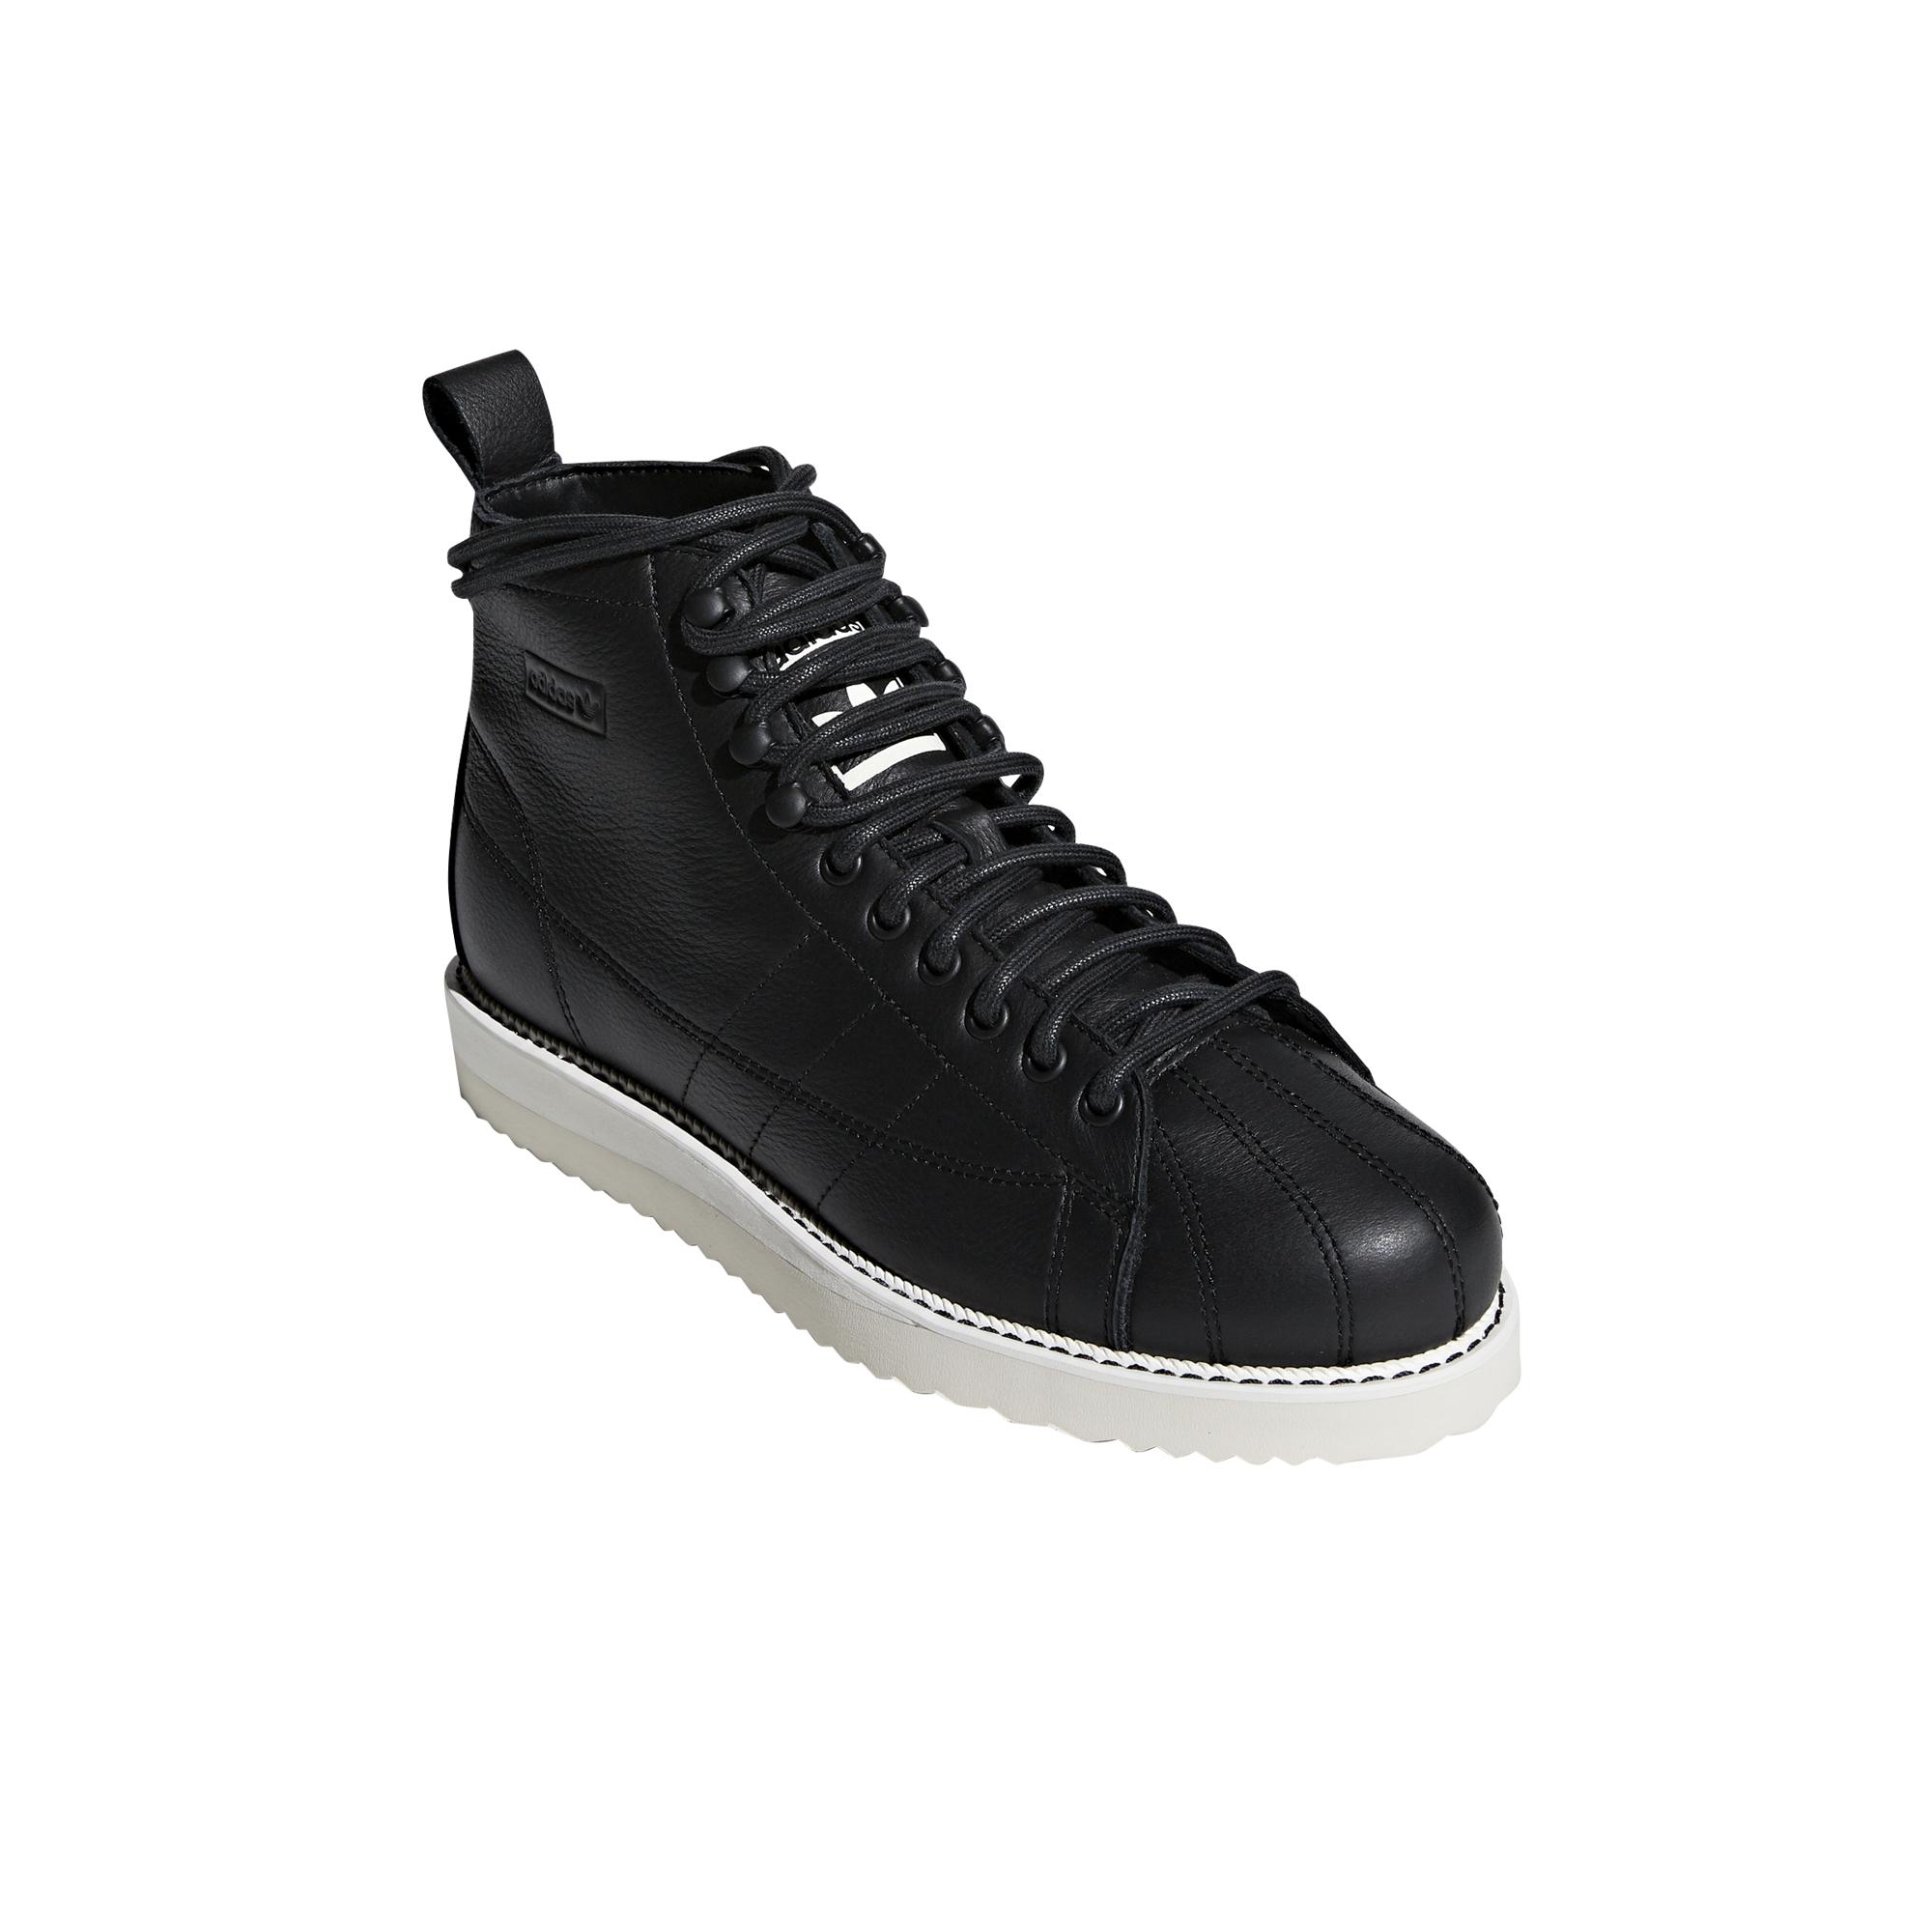 meilleur authentique 46010 b9e51 Chaussures femme adidas Superstar